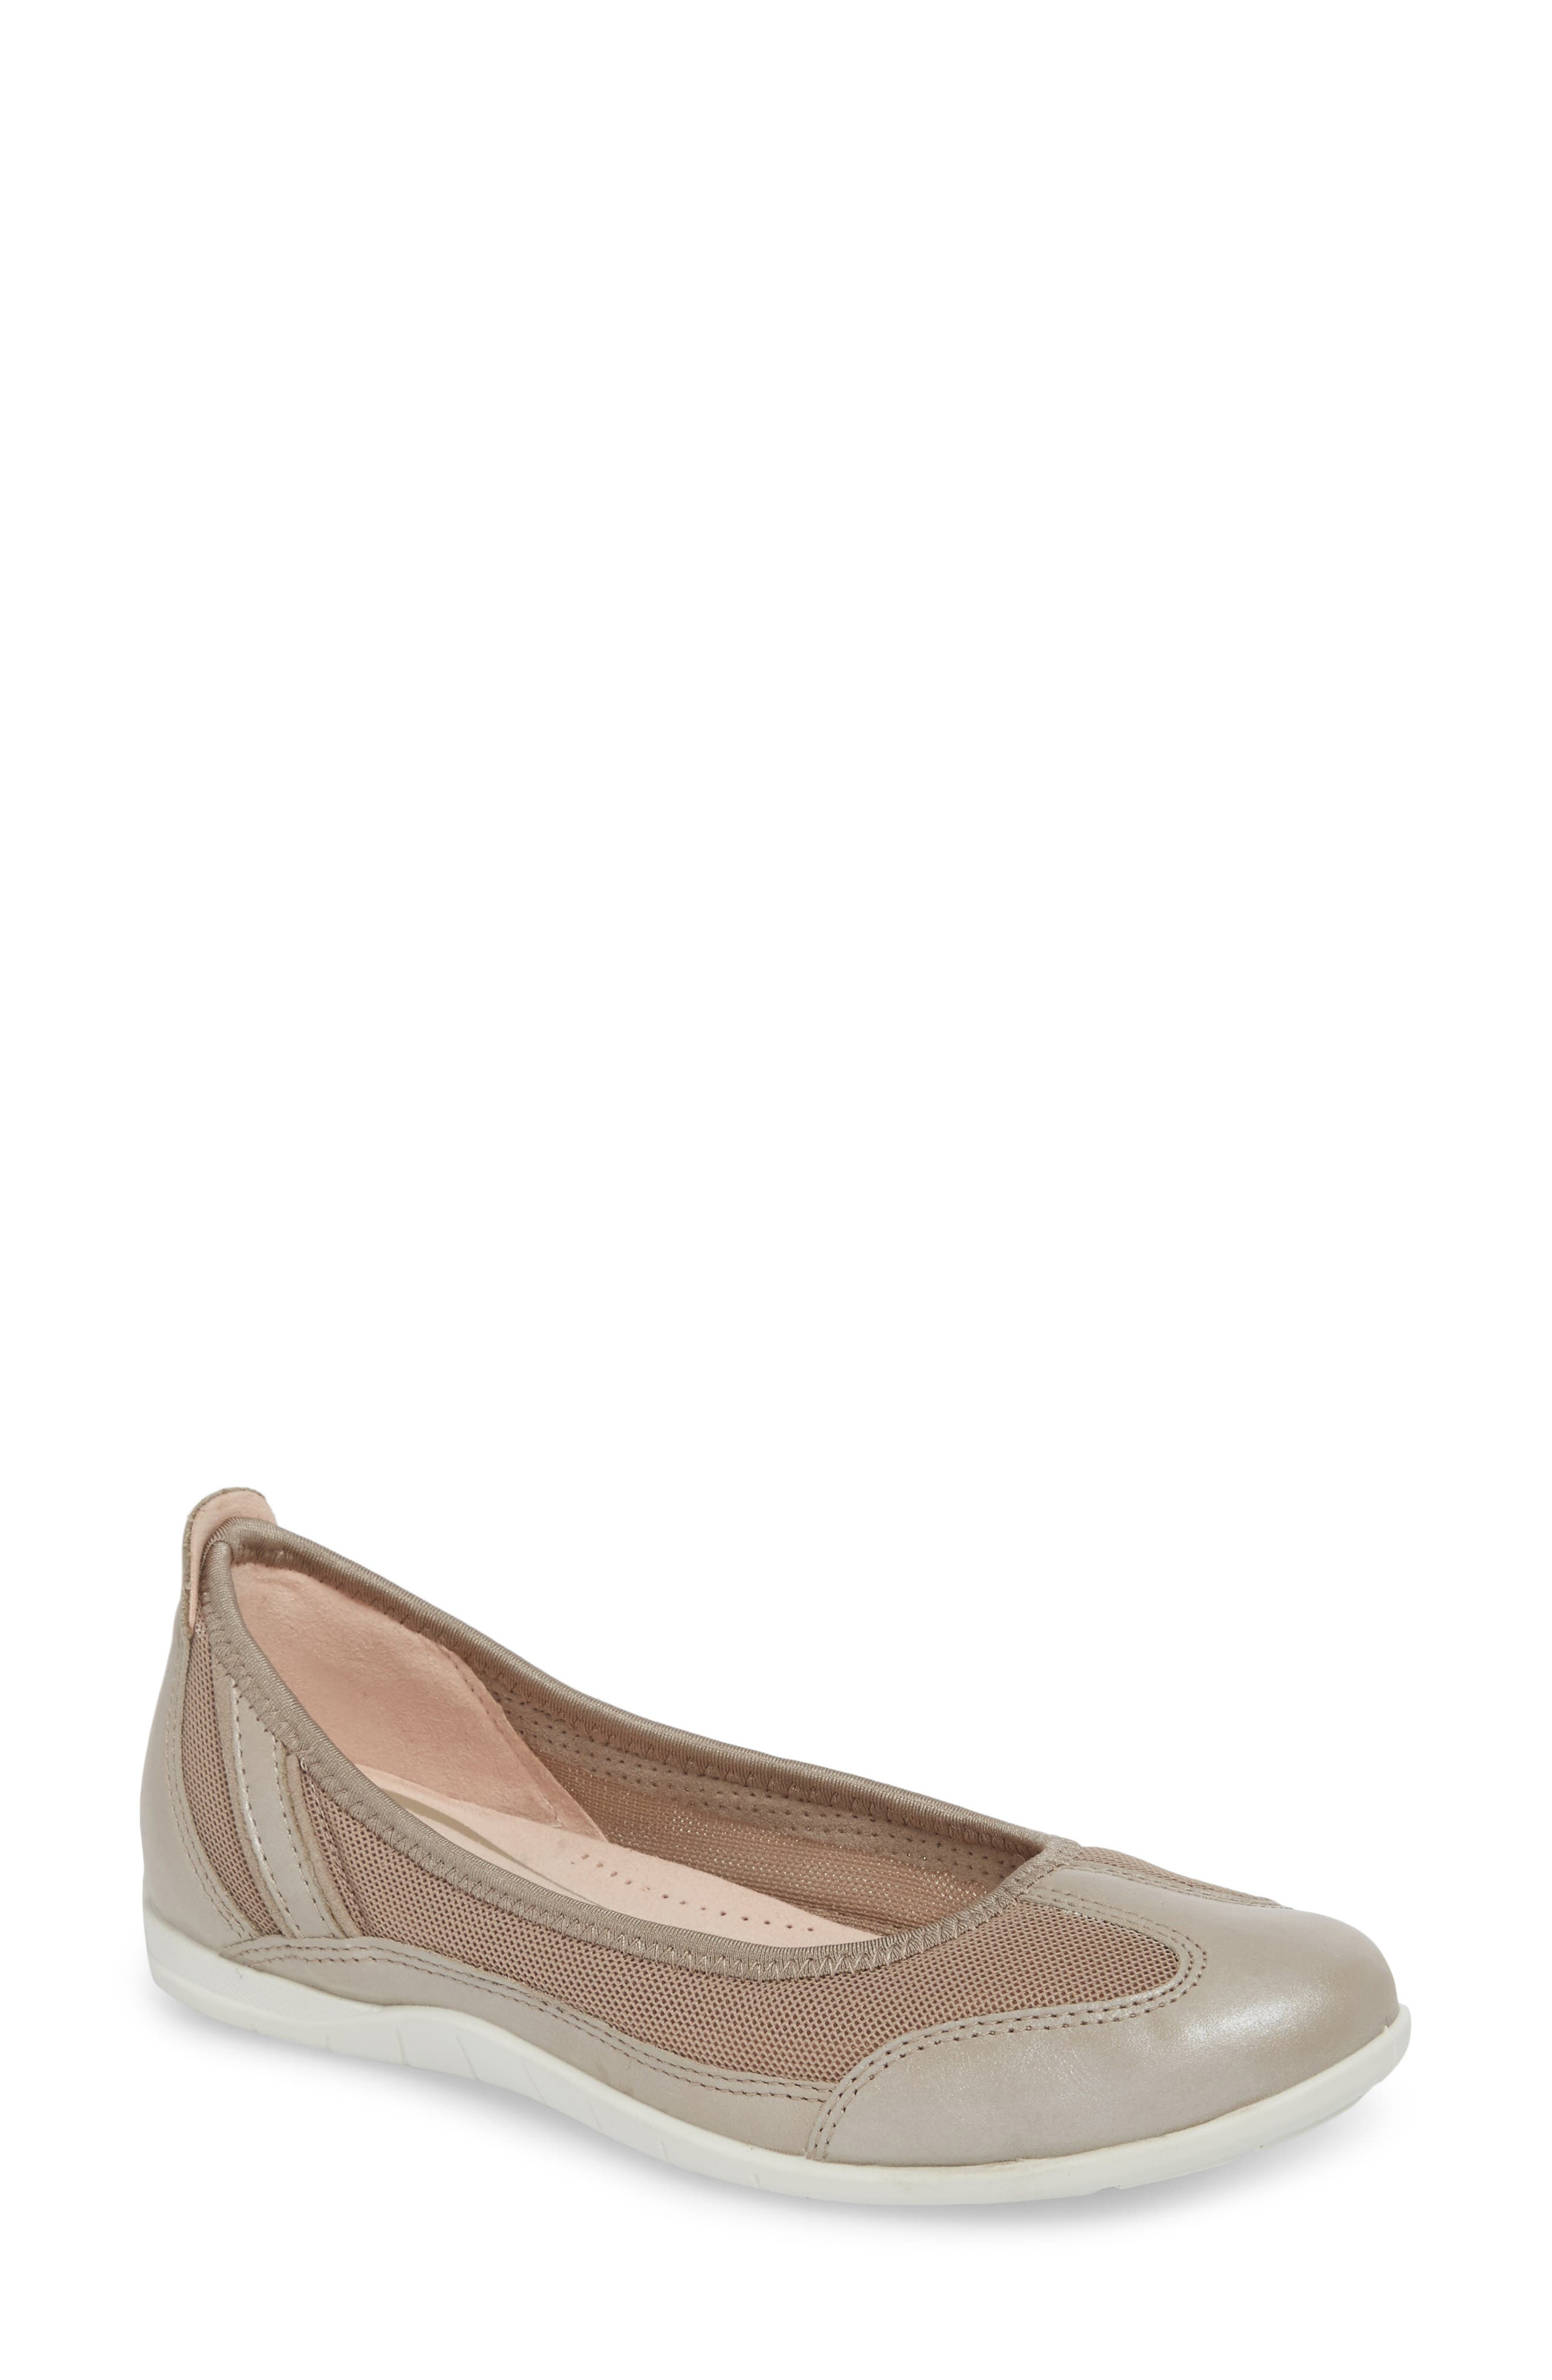 Alternate Image 1 Selected - ECCO 'Bluma' Ballet Sneaker (Women)